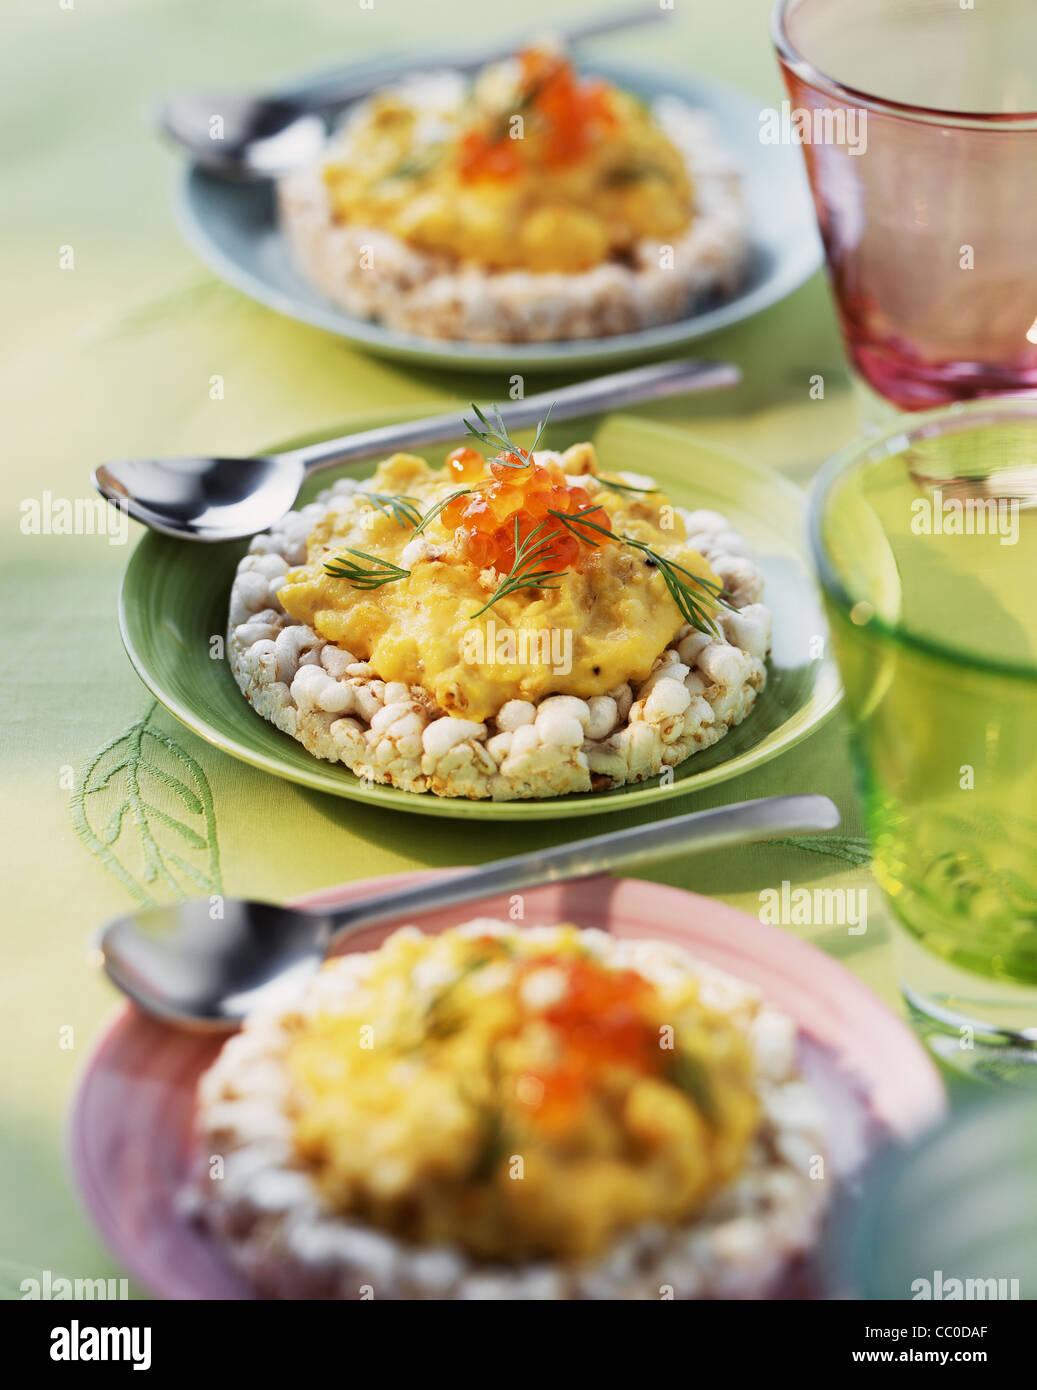 cooking Scramble Eggs on Rice Crispy - Stock Image